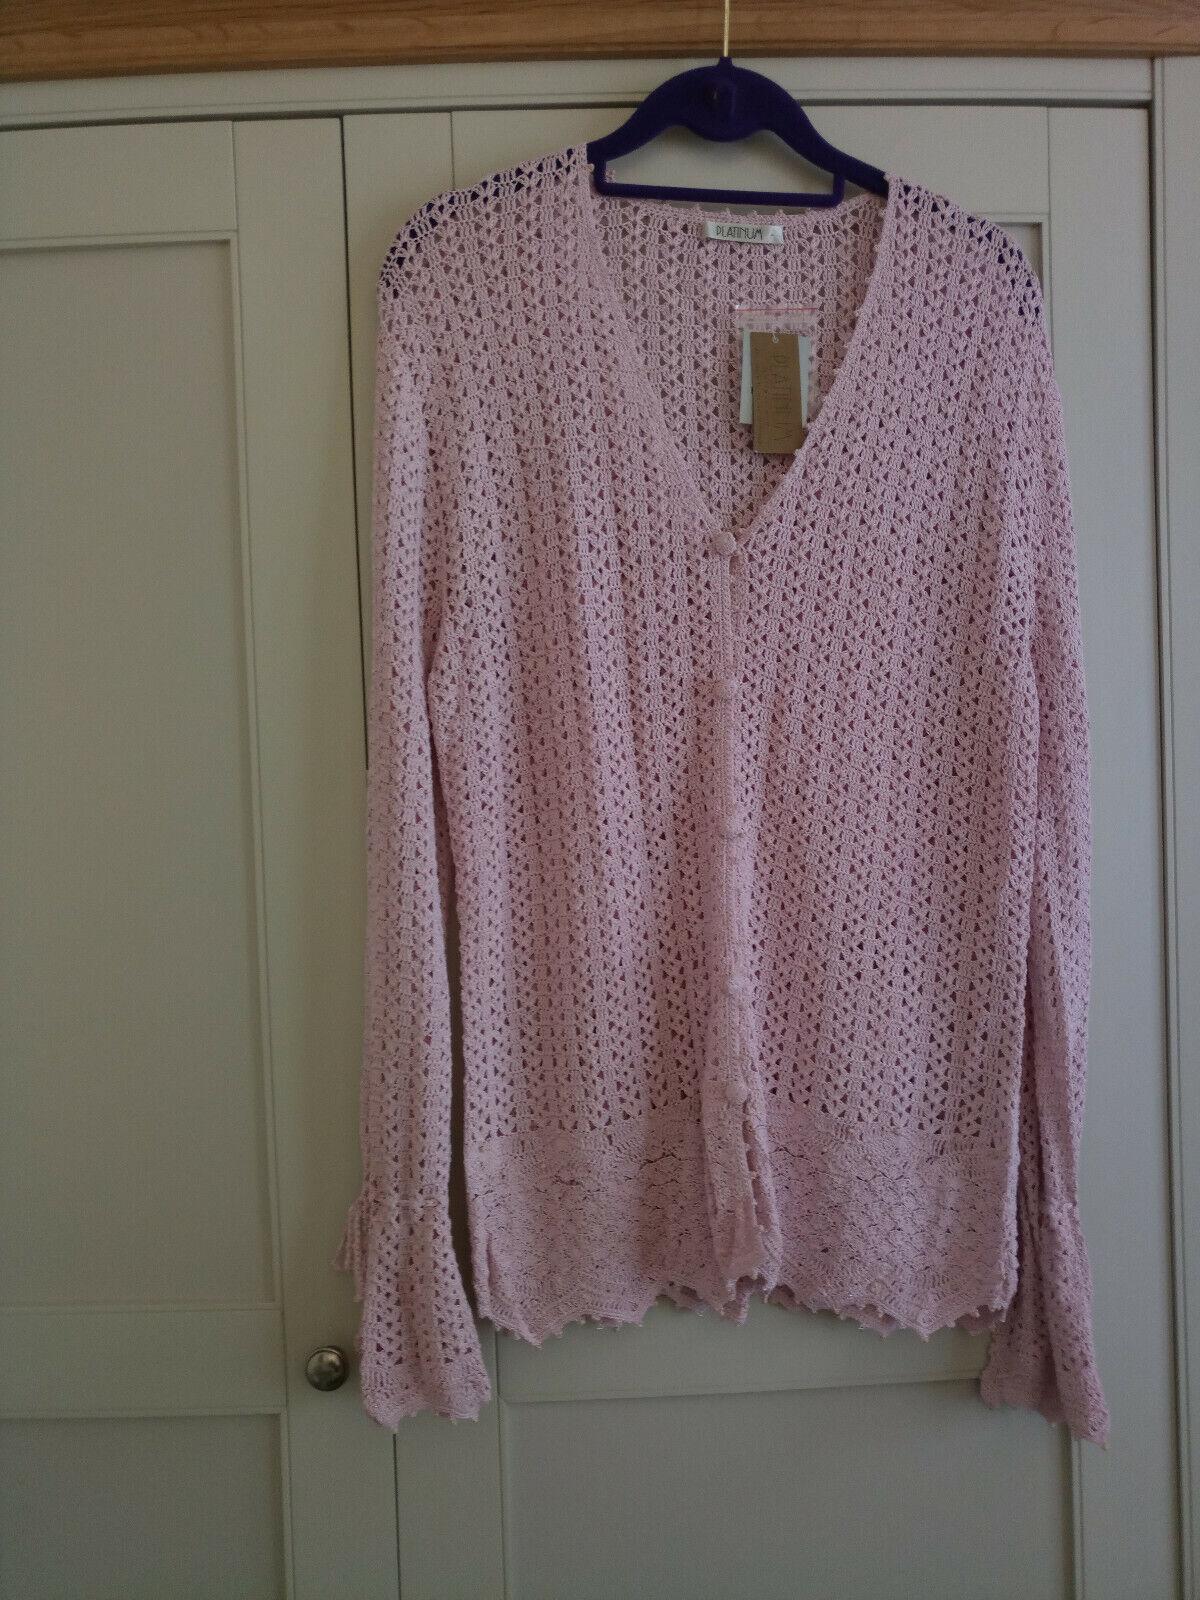 Pink cardigan, size large (16), House of Fraser Platinum range. Brand new